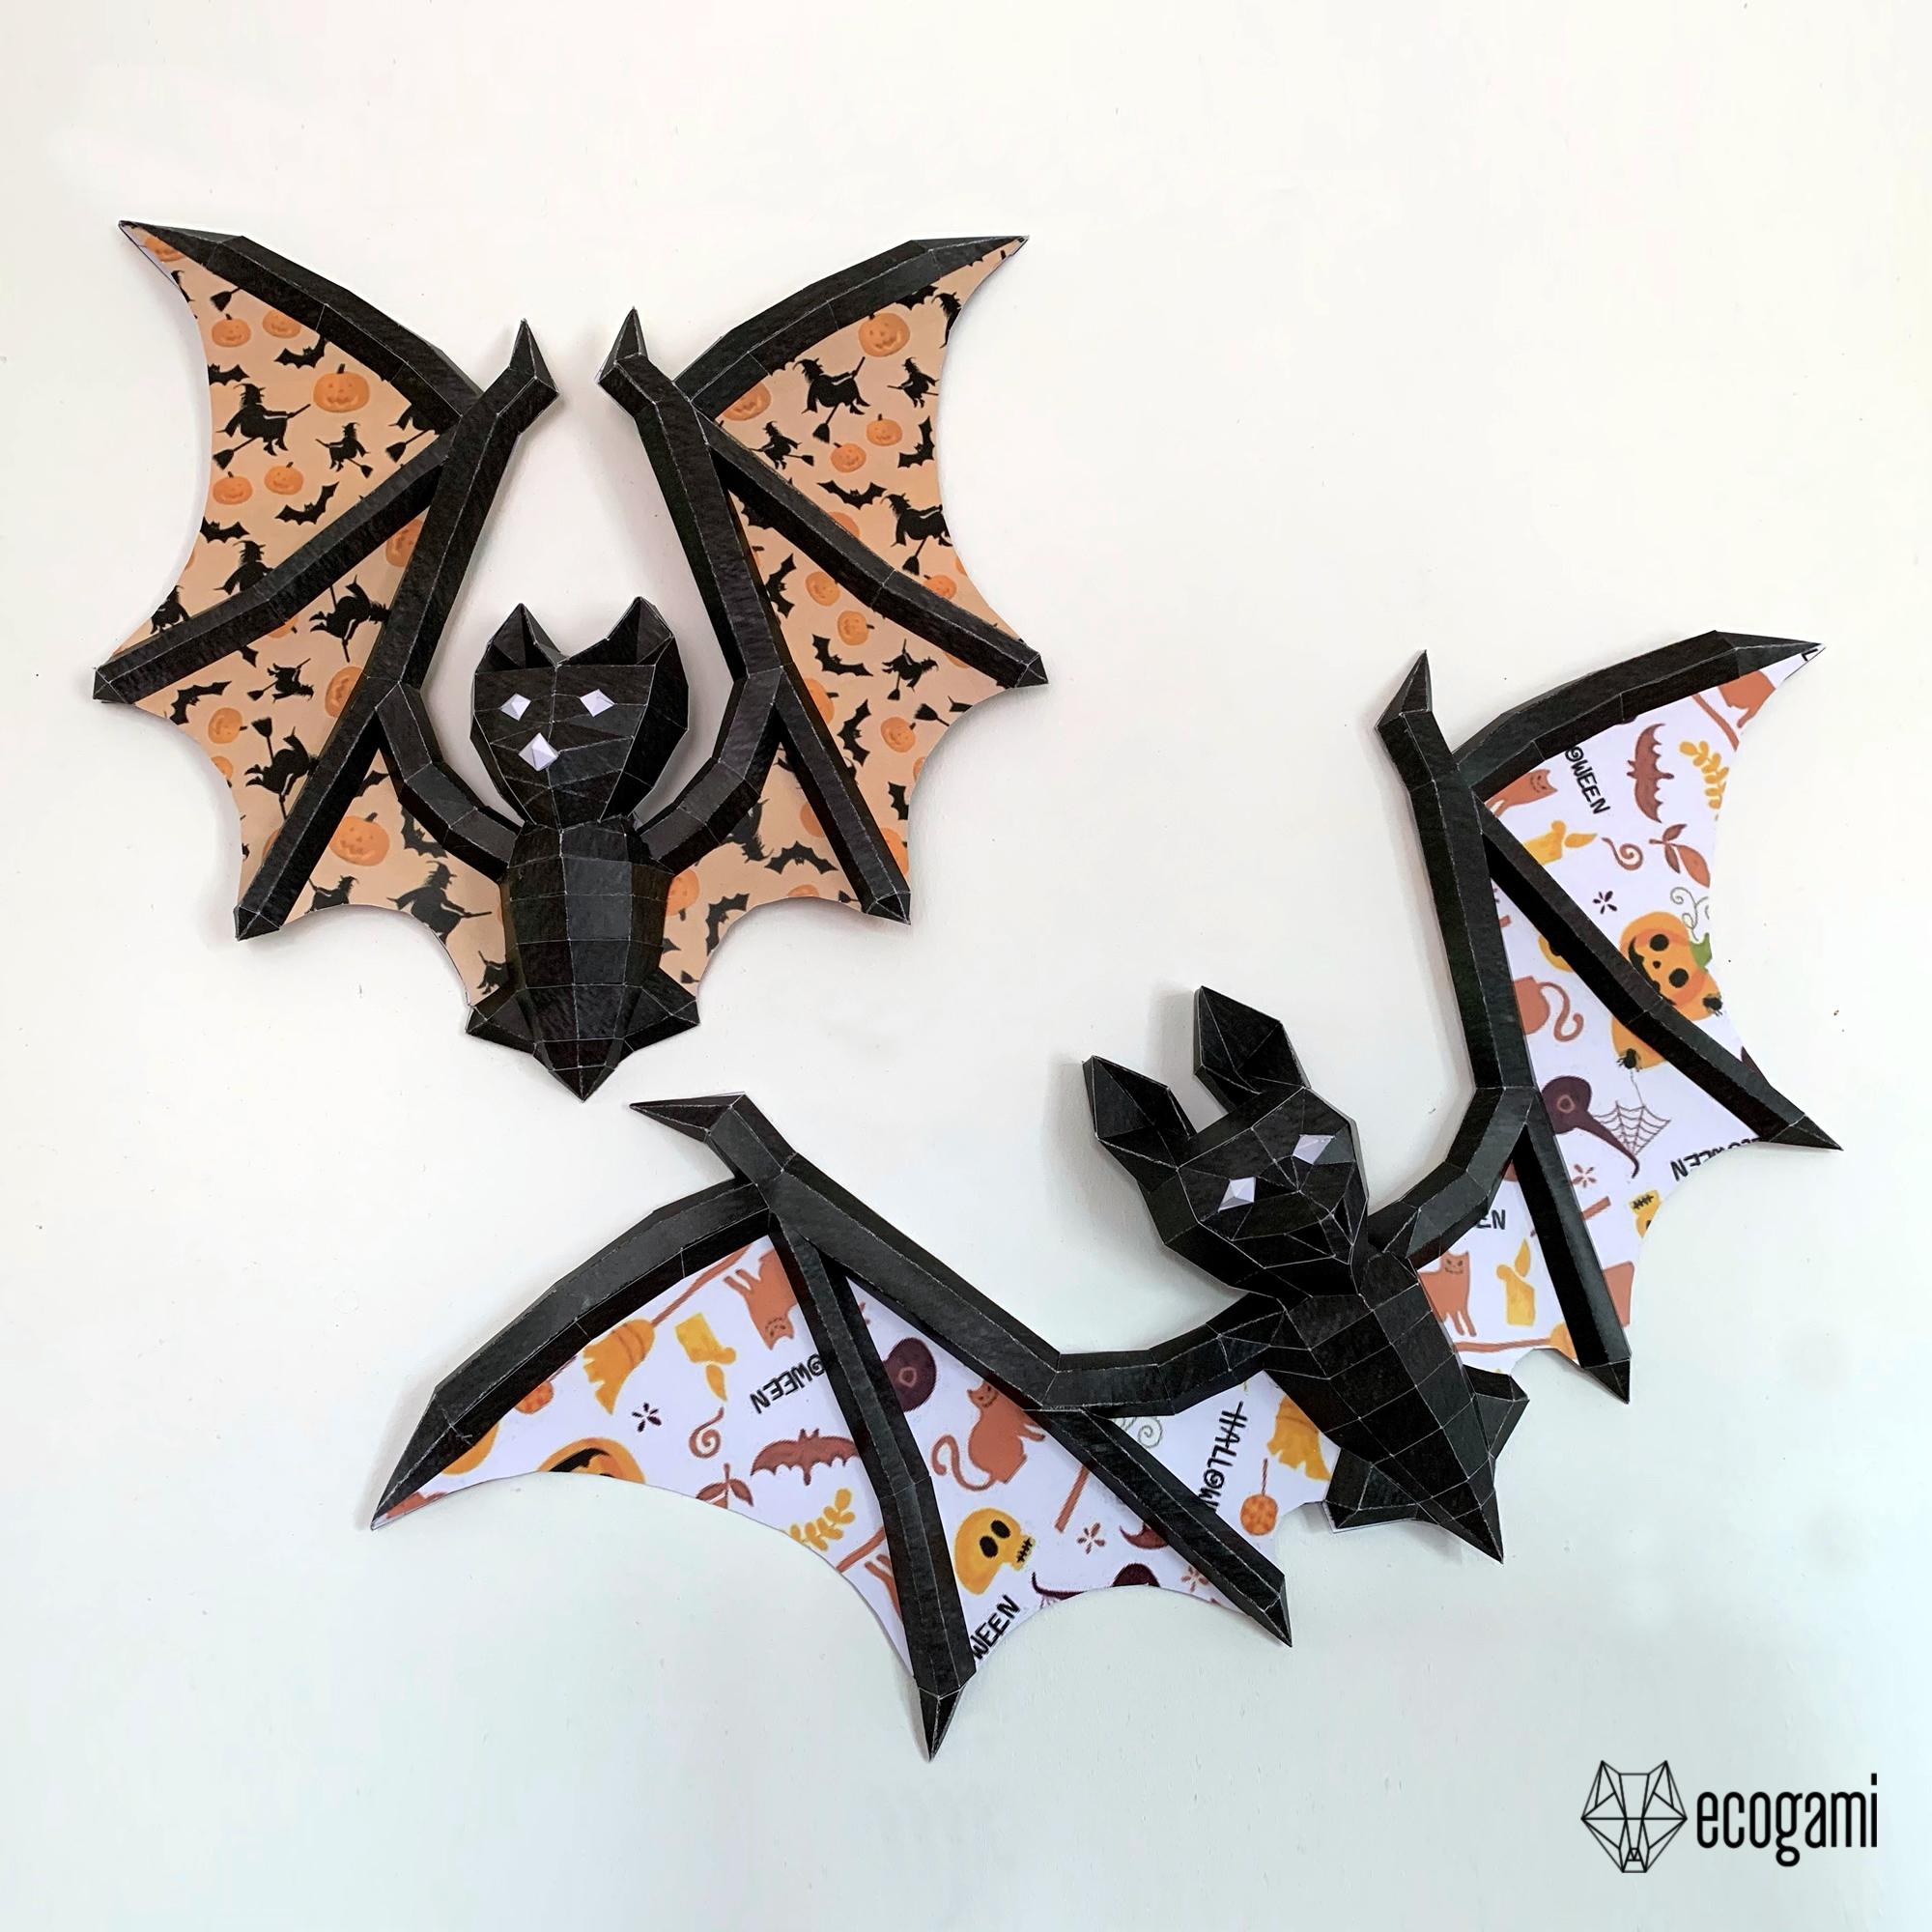 Bat papercraft sculptures, printable 3D puzzle, 3D papercraft Pdf template to